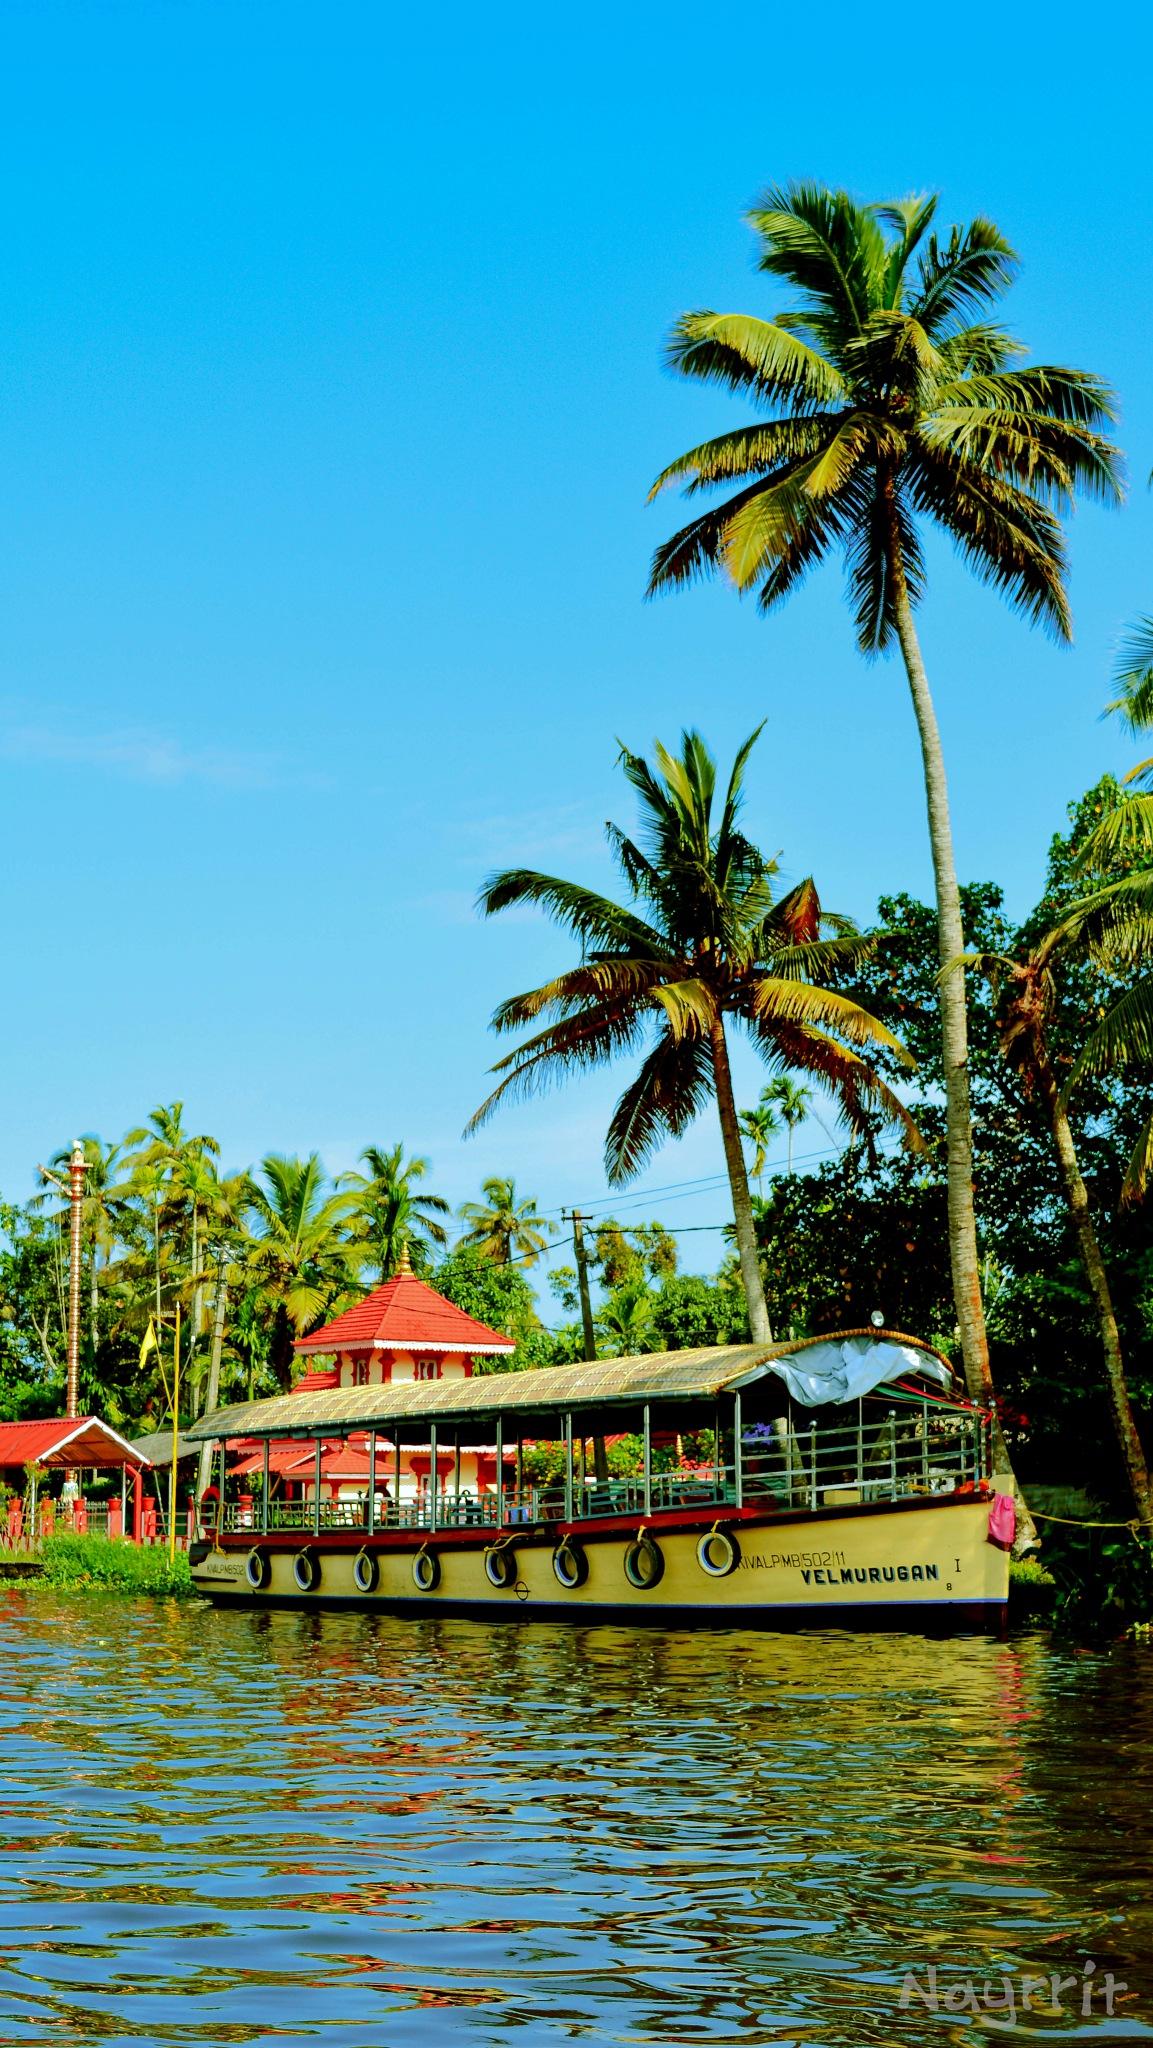 Kerala Beauty by Nayrrit Das